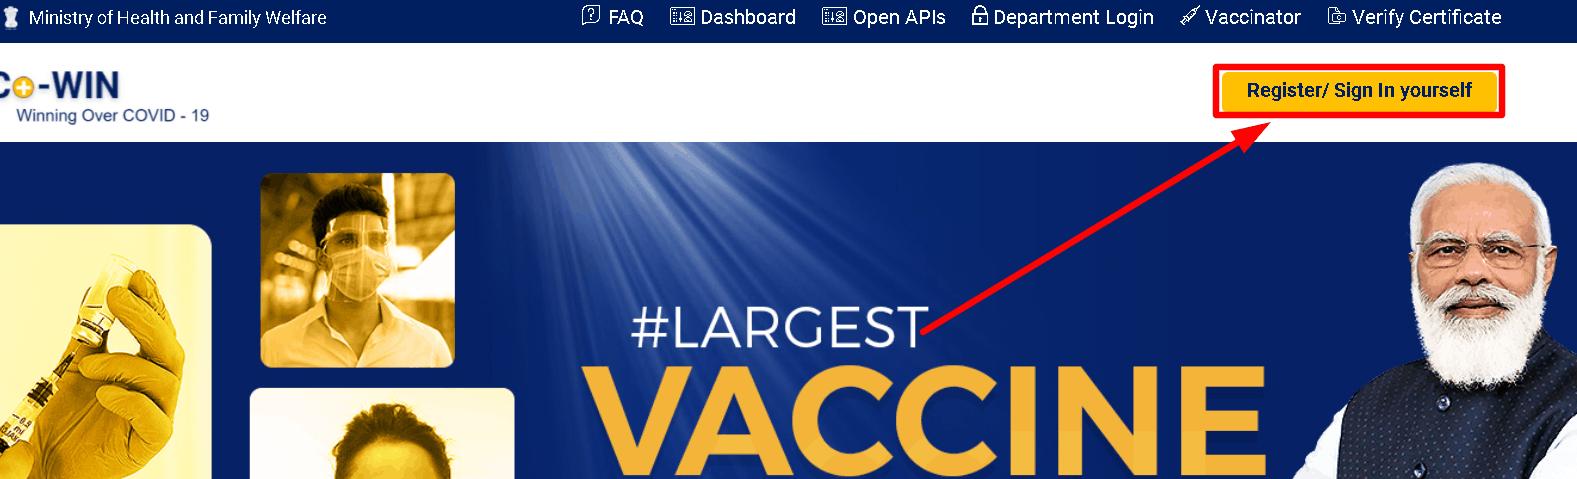 Covid vaccination online registration